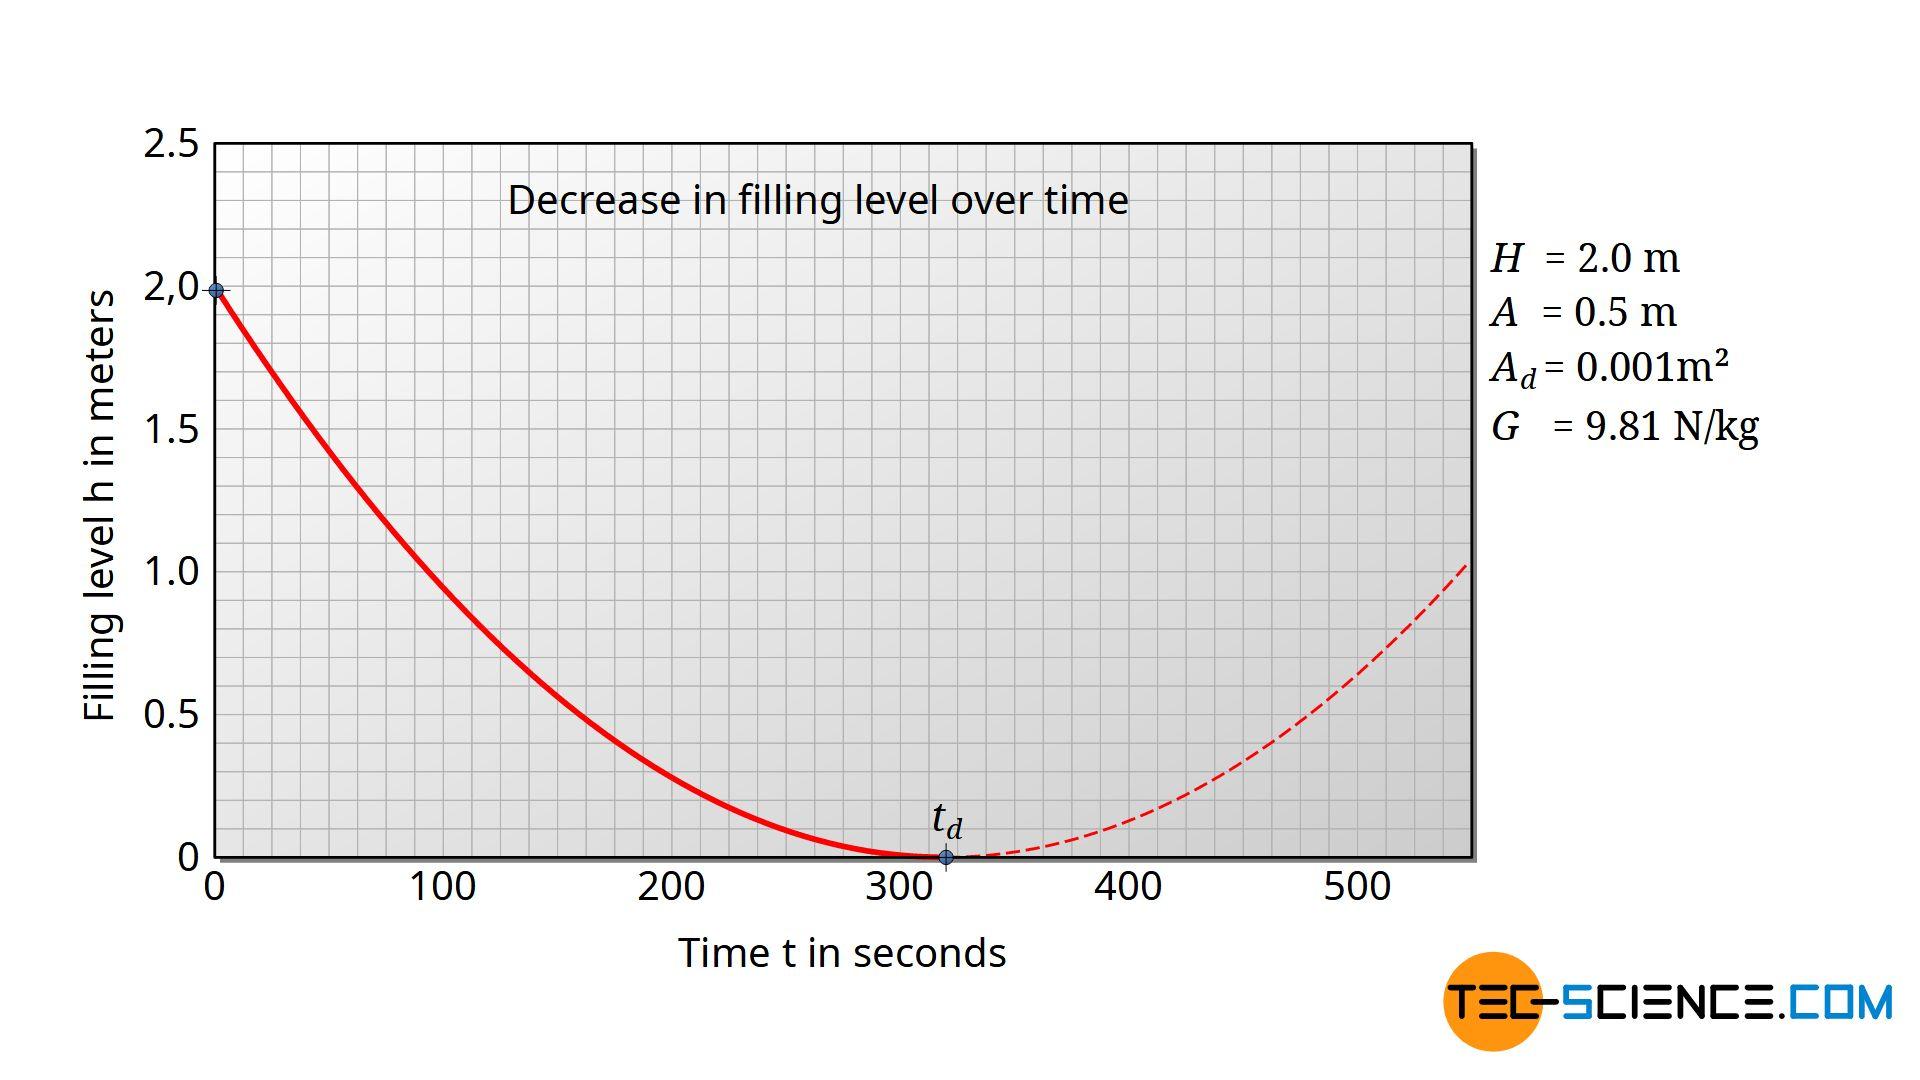 Decrease in filling level over time